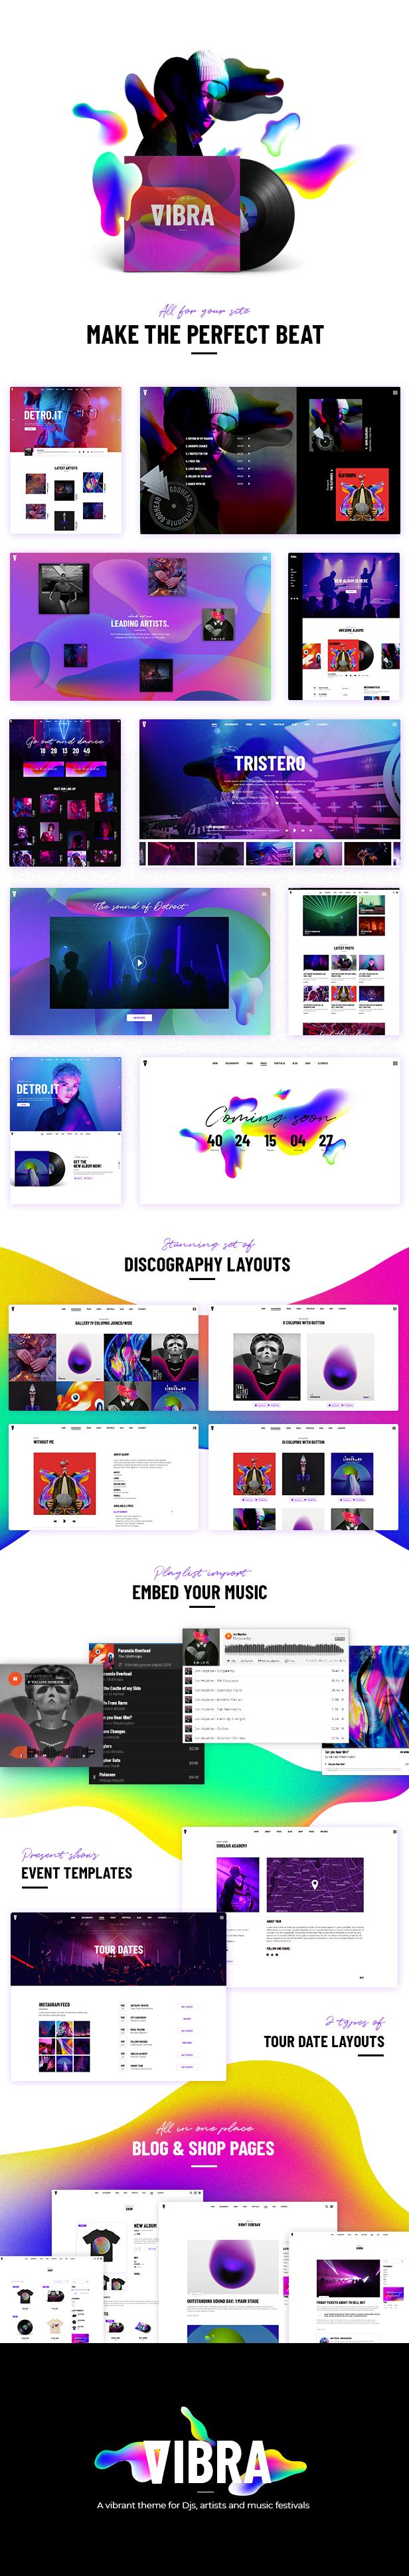 Vibra - Music Theme for DJs, Artists and Festivals - 1